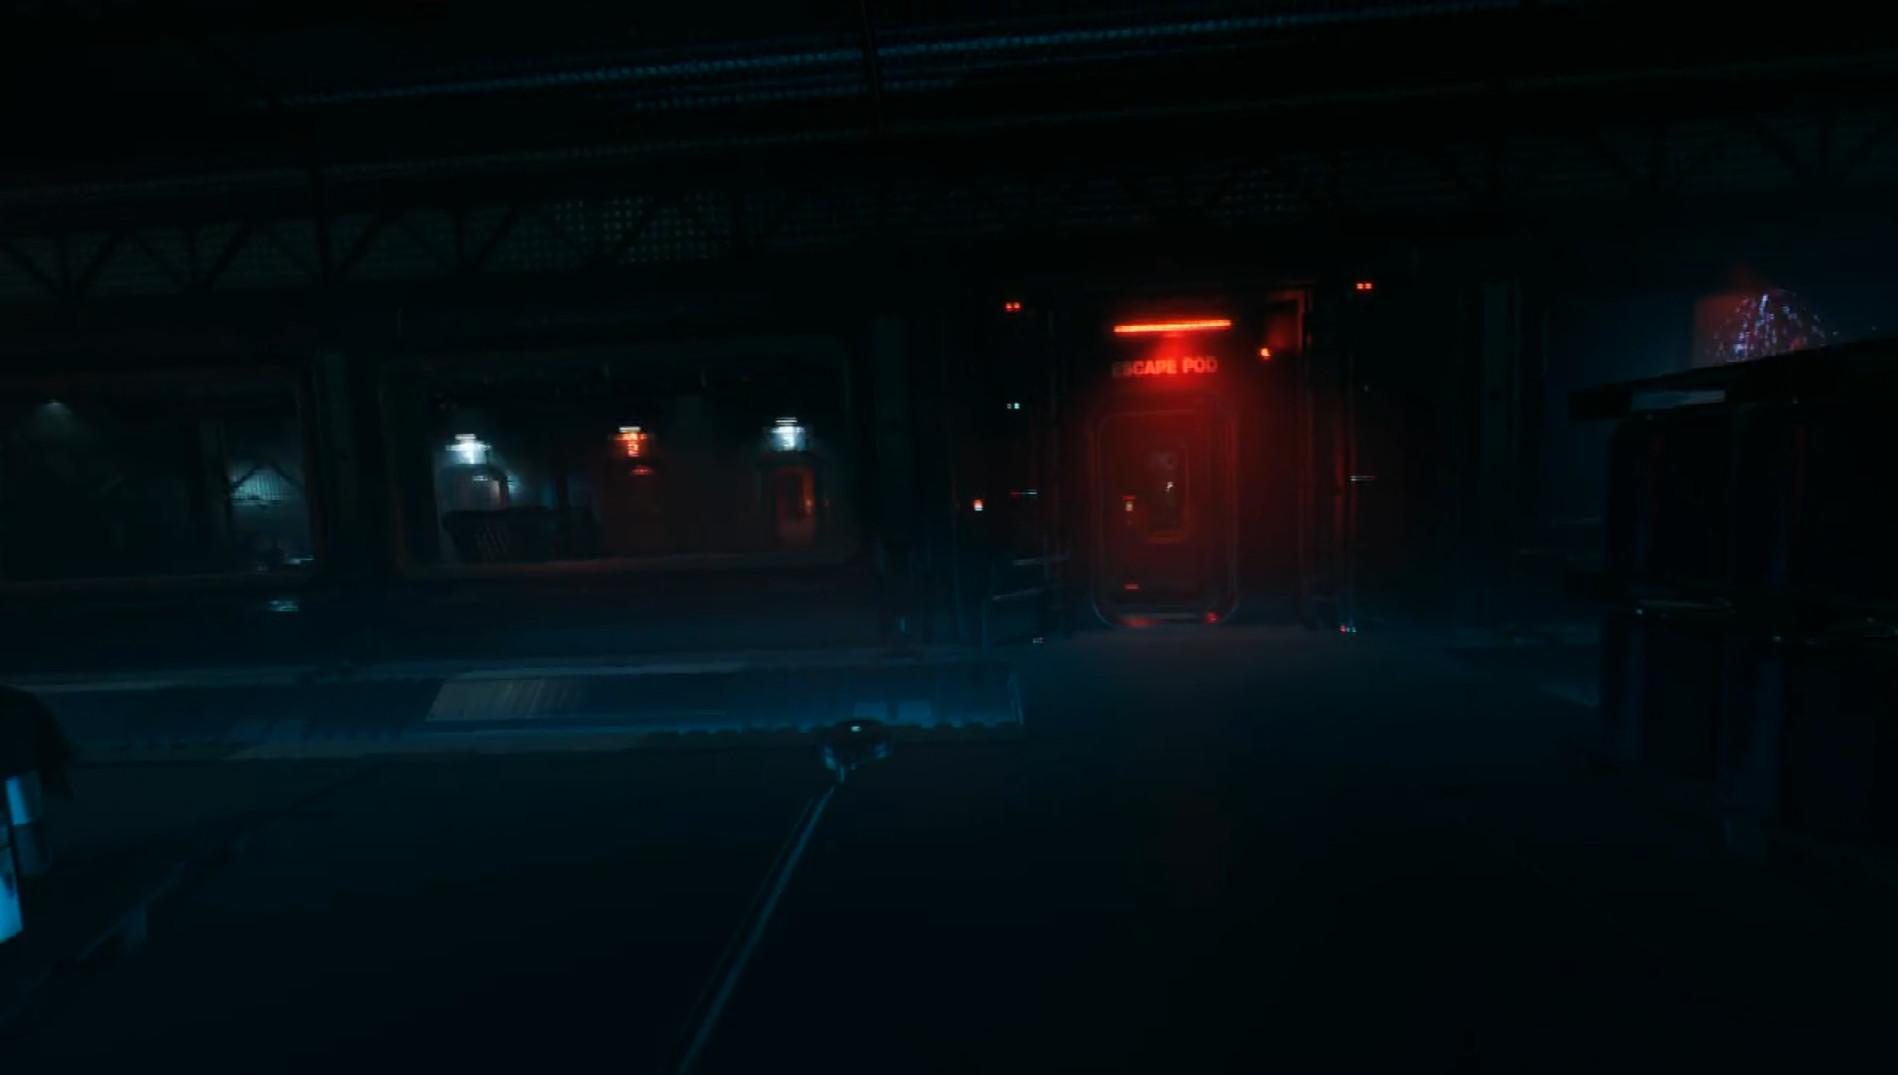 Awaken Realms анонсировала видеоигру Nemesis: Distress —адаптацию настолки «Немезида» 1